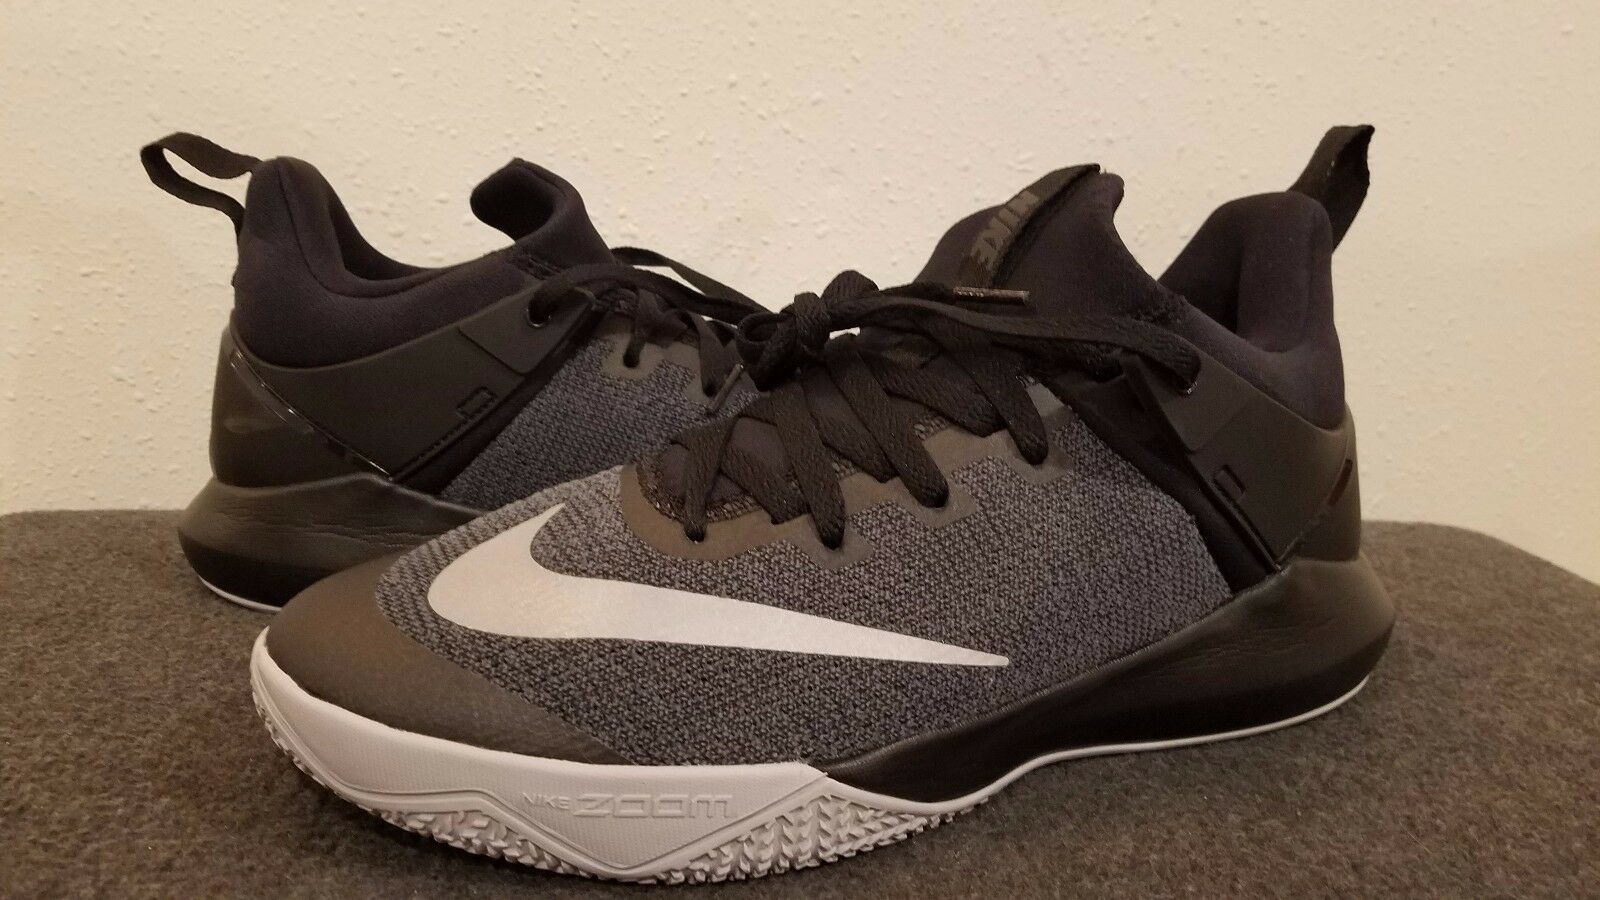 Nike Zoom Shift Women's Basketball Shoes SZ 11.5 Black / Chrome   917731  001